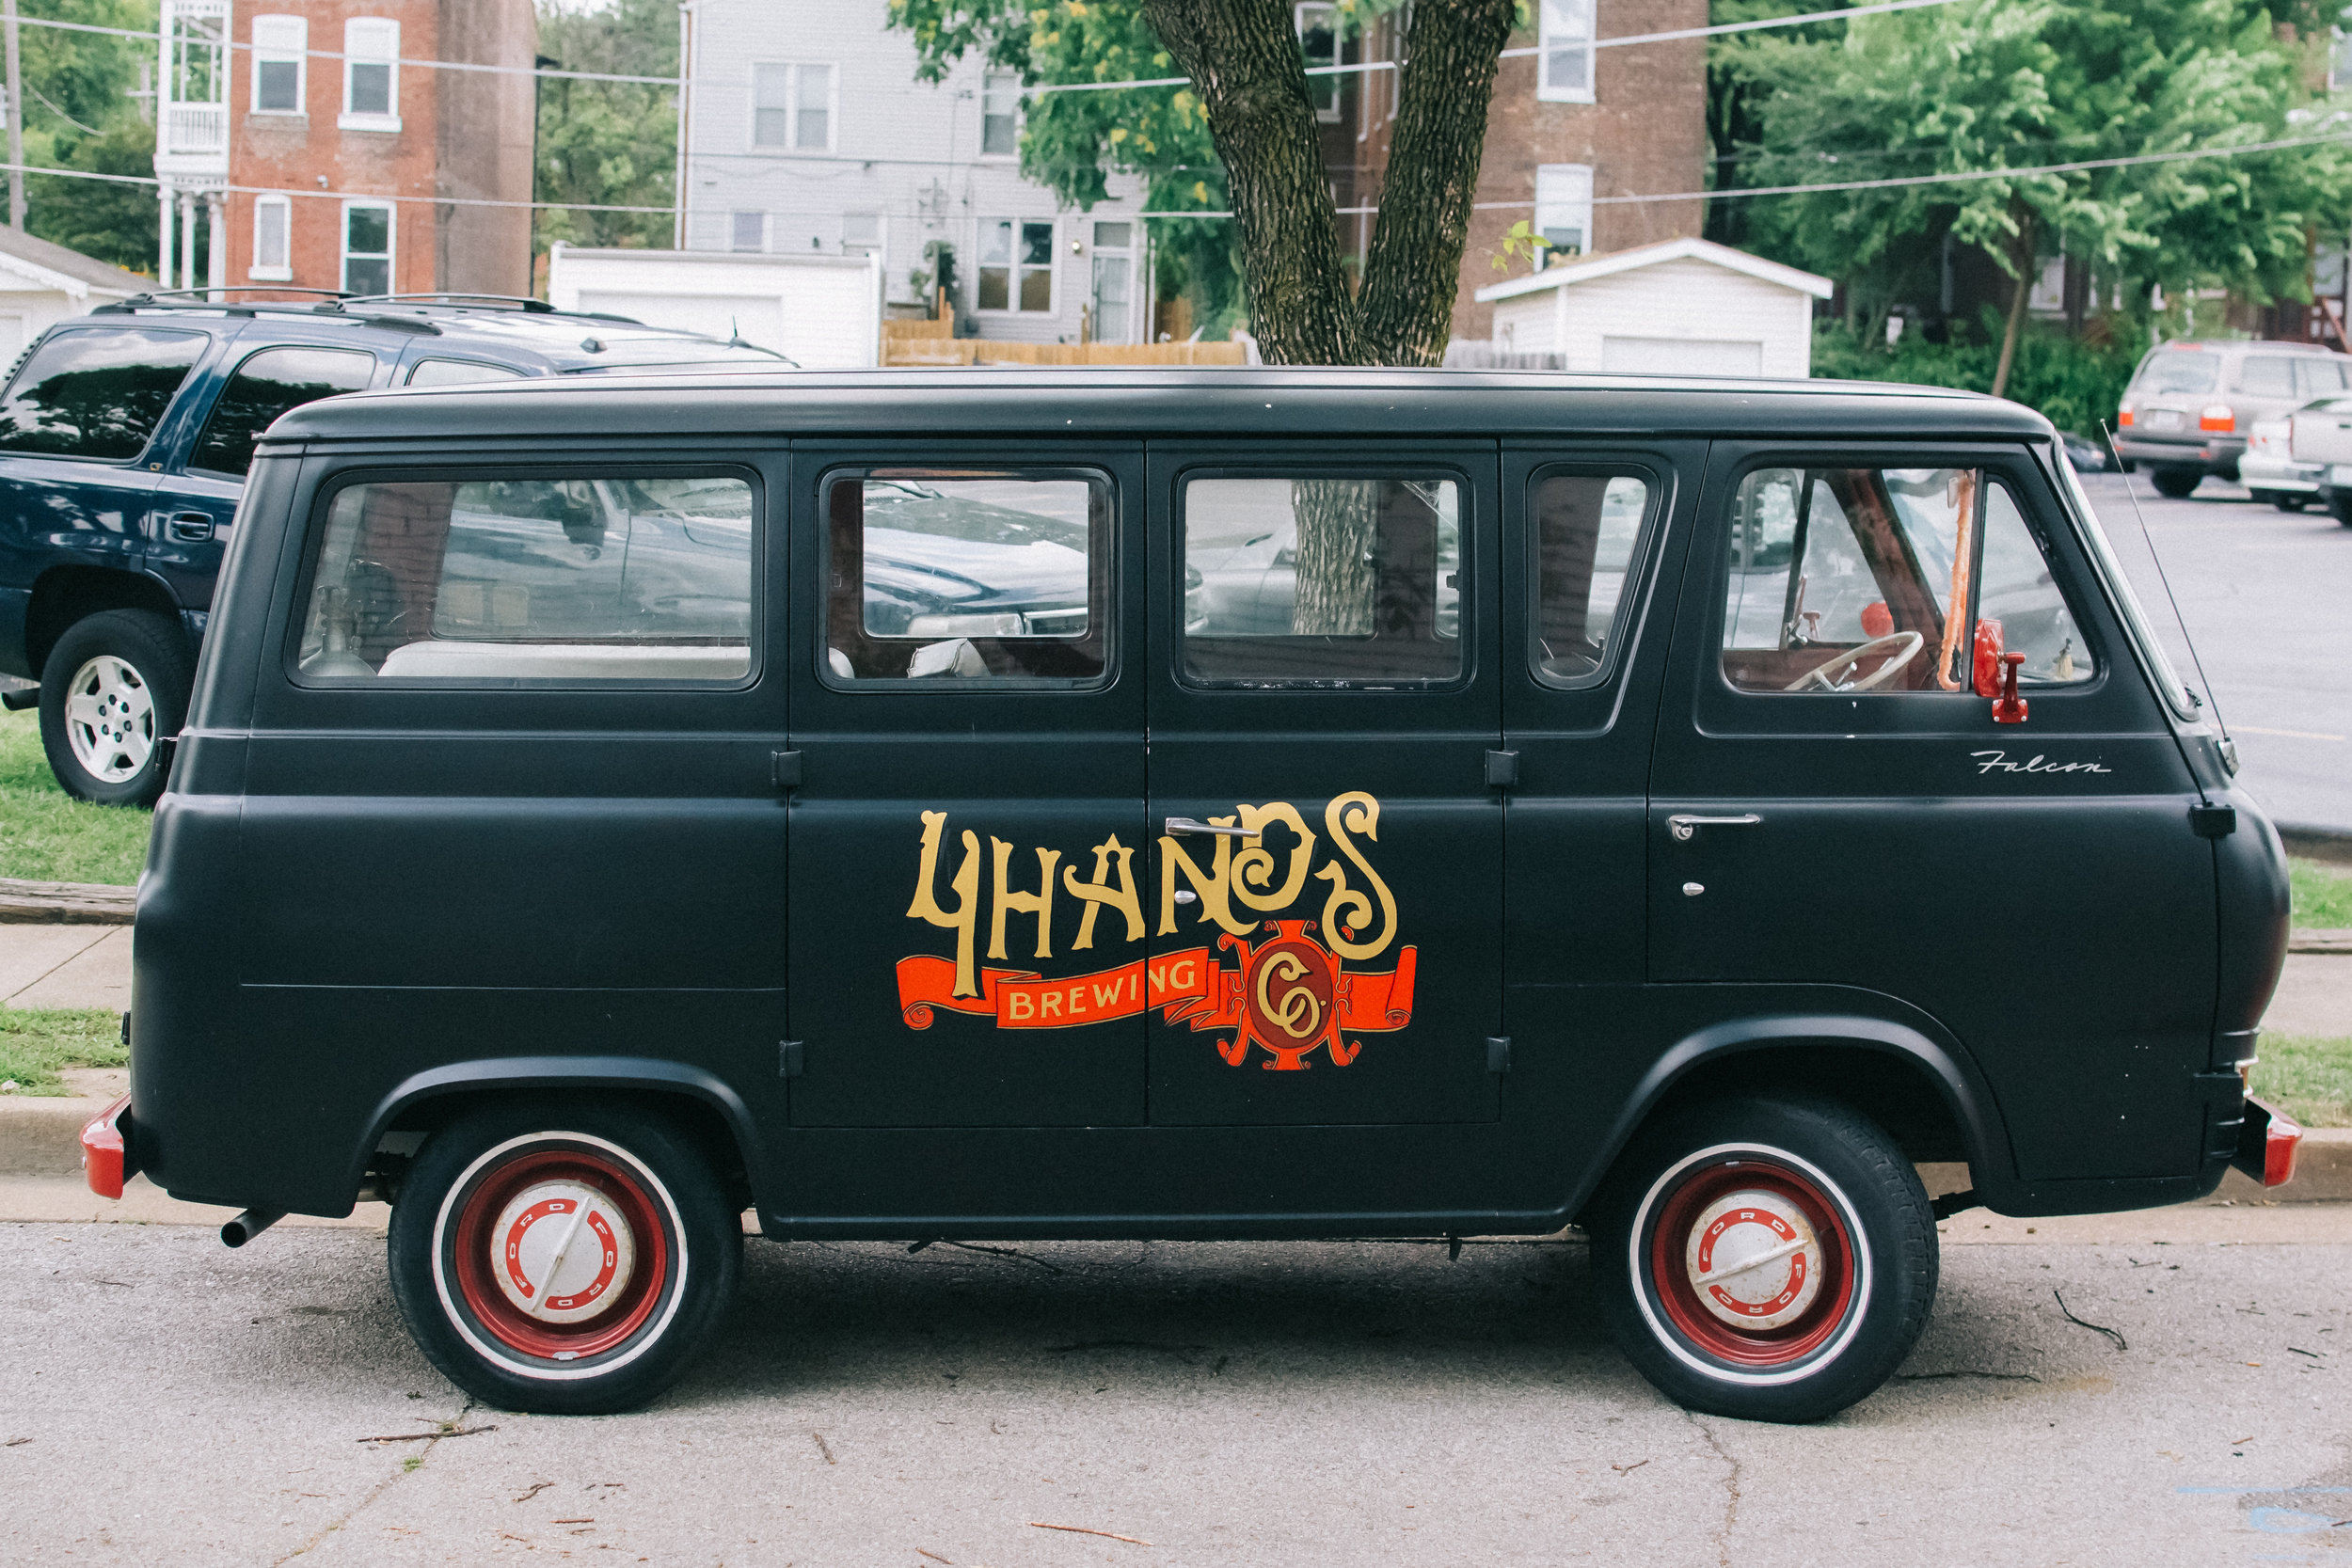 4-Hands-Brewing-St-Louis-Missouri-Beer-Matt-Sampson-Photography-Van.jpg